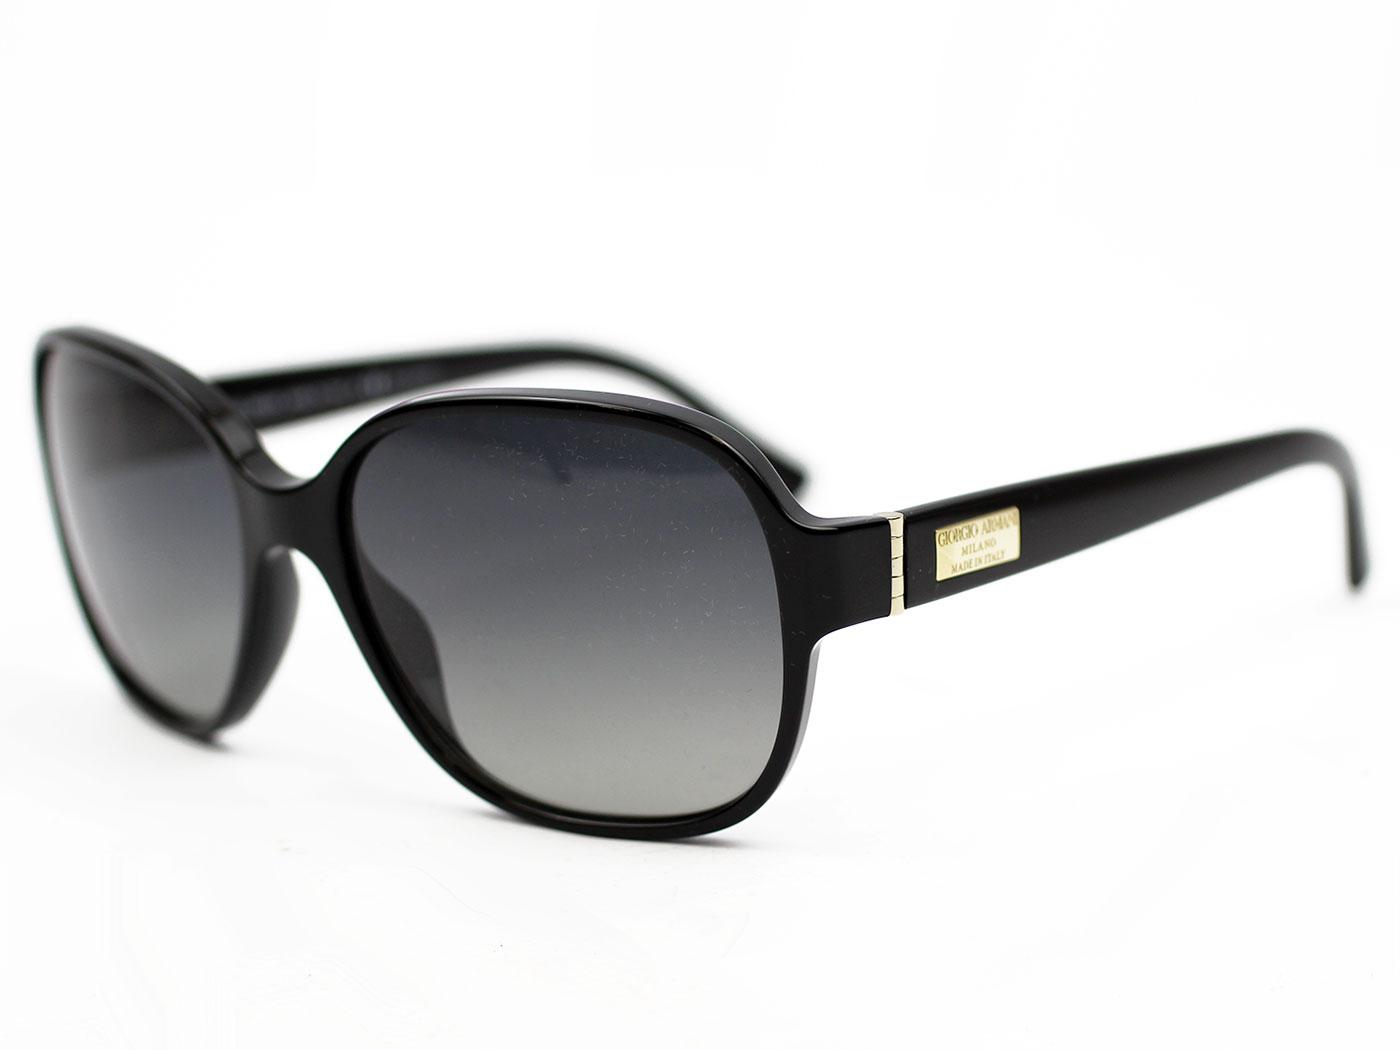 GIORGIO ARMANI 50s Vintage Square Frame Sunglasses